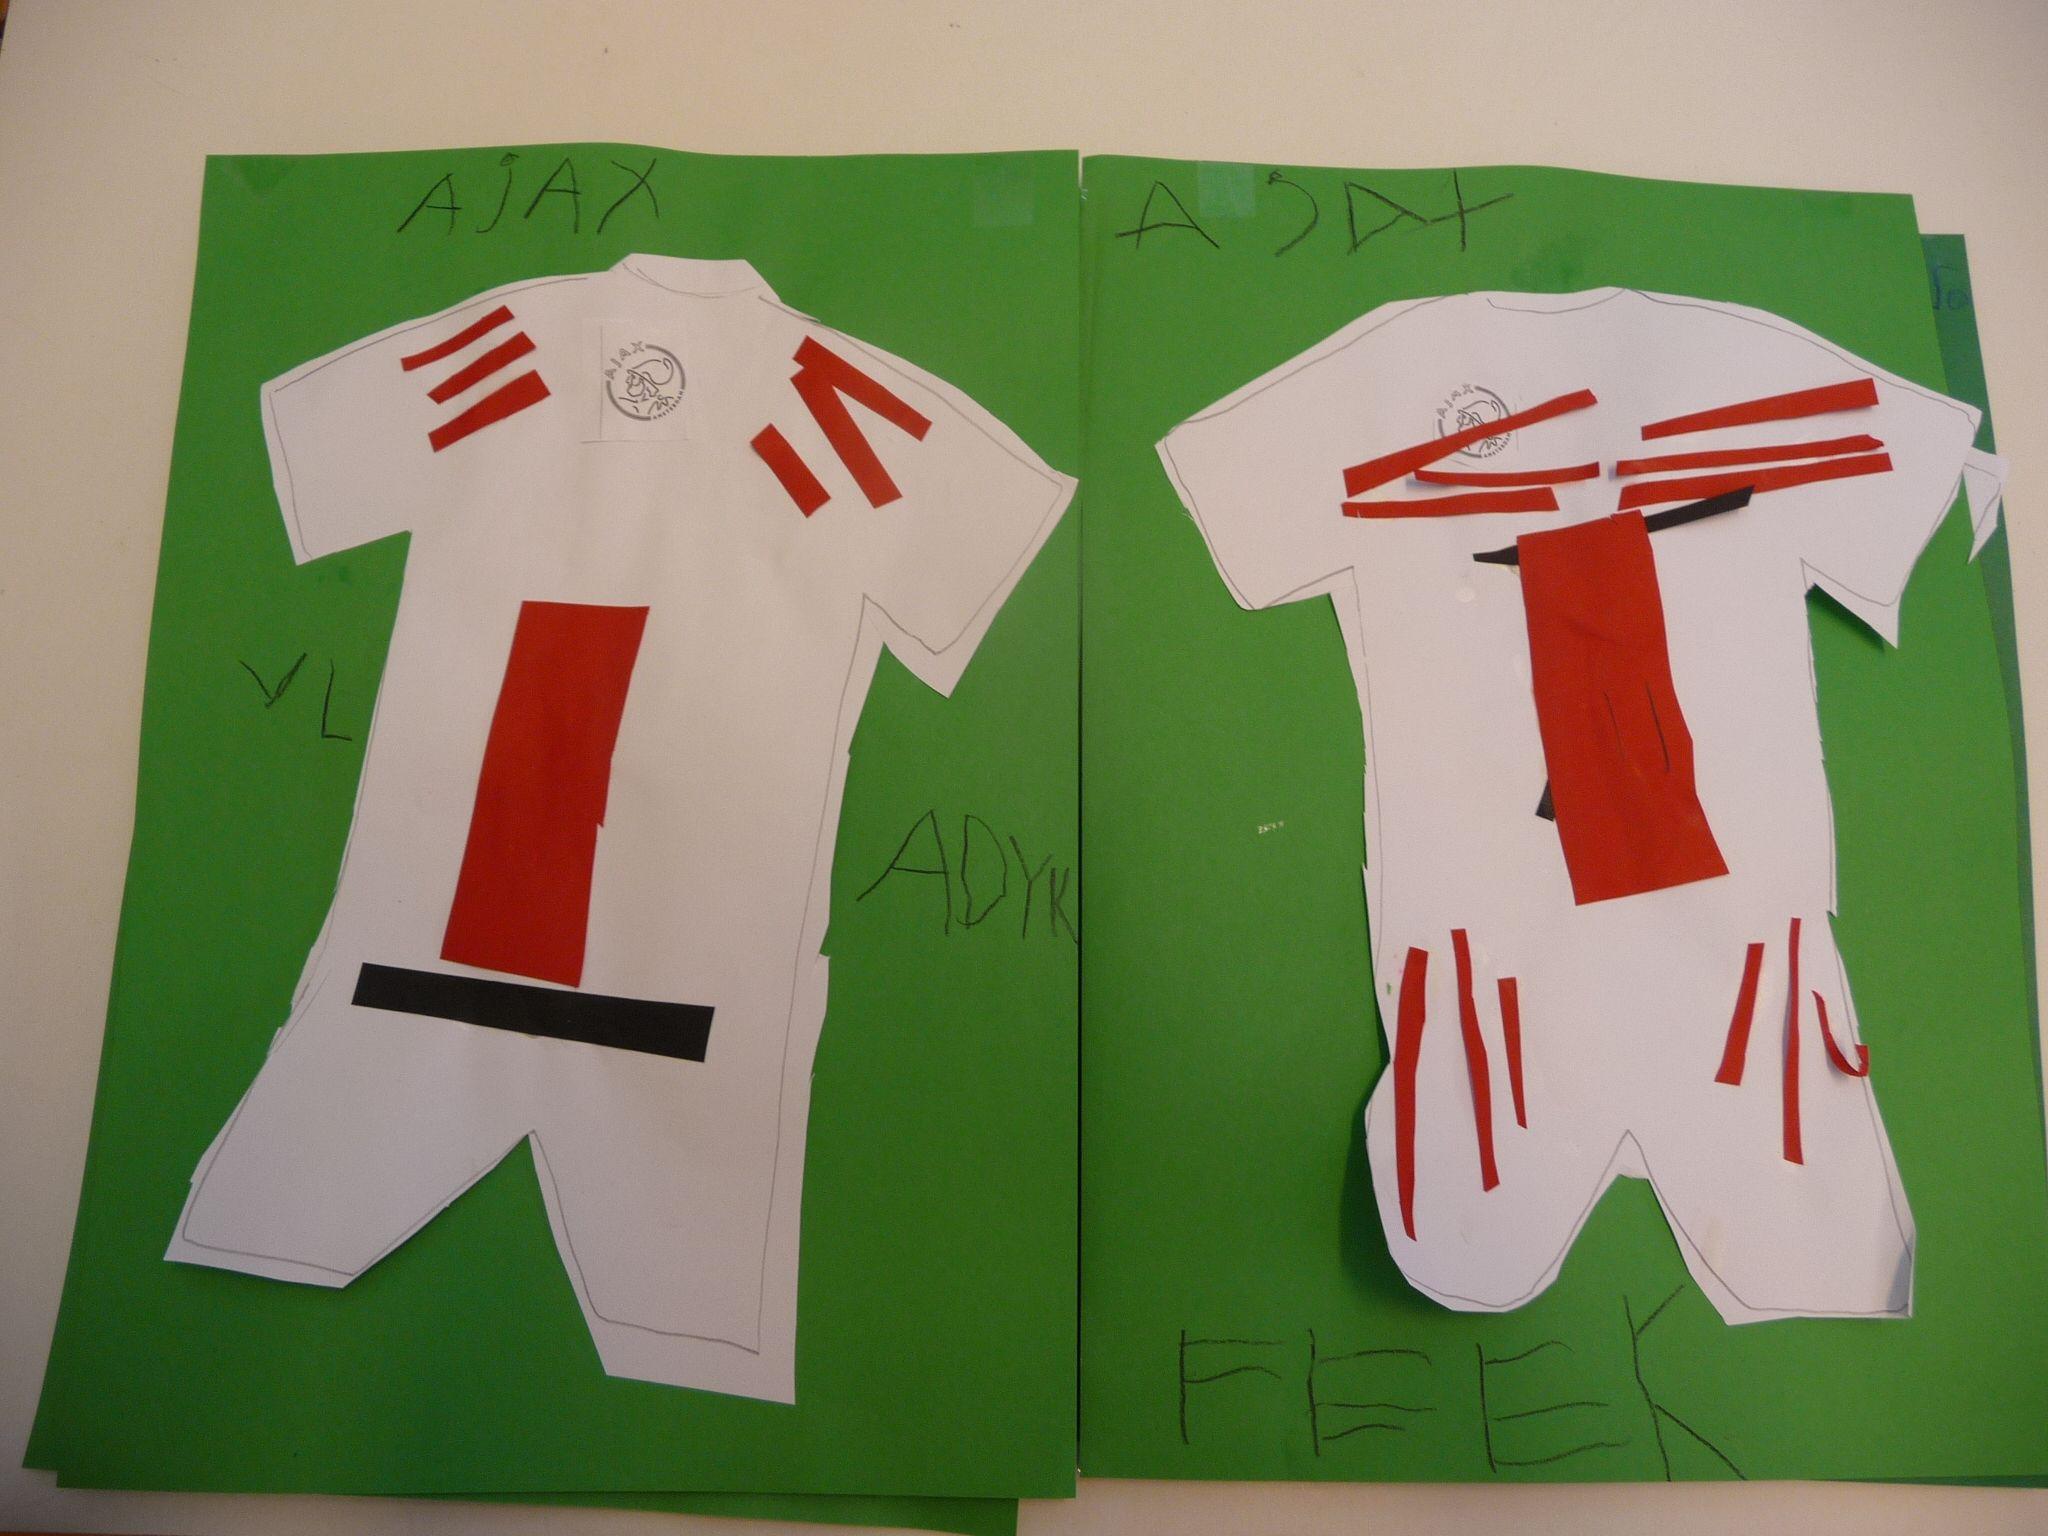 Pin Van Juf Ineke Op School Map Juf Ineke Allerlei Knutselideeen Op School Gefotografeerd Sport Voetbaltenue Voetbal